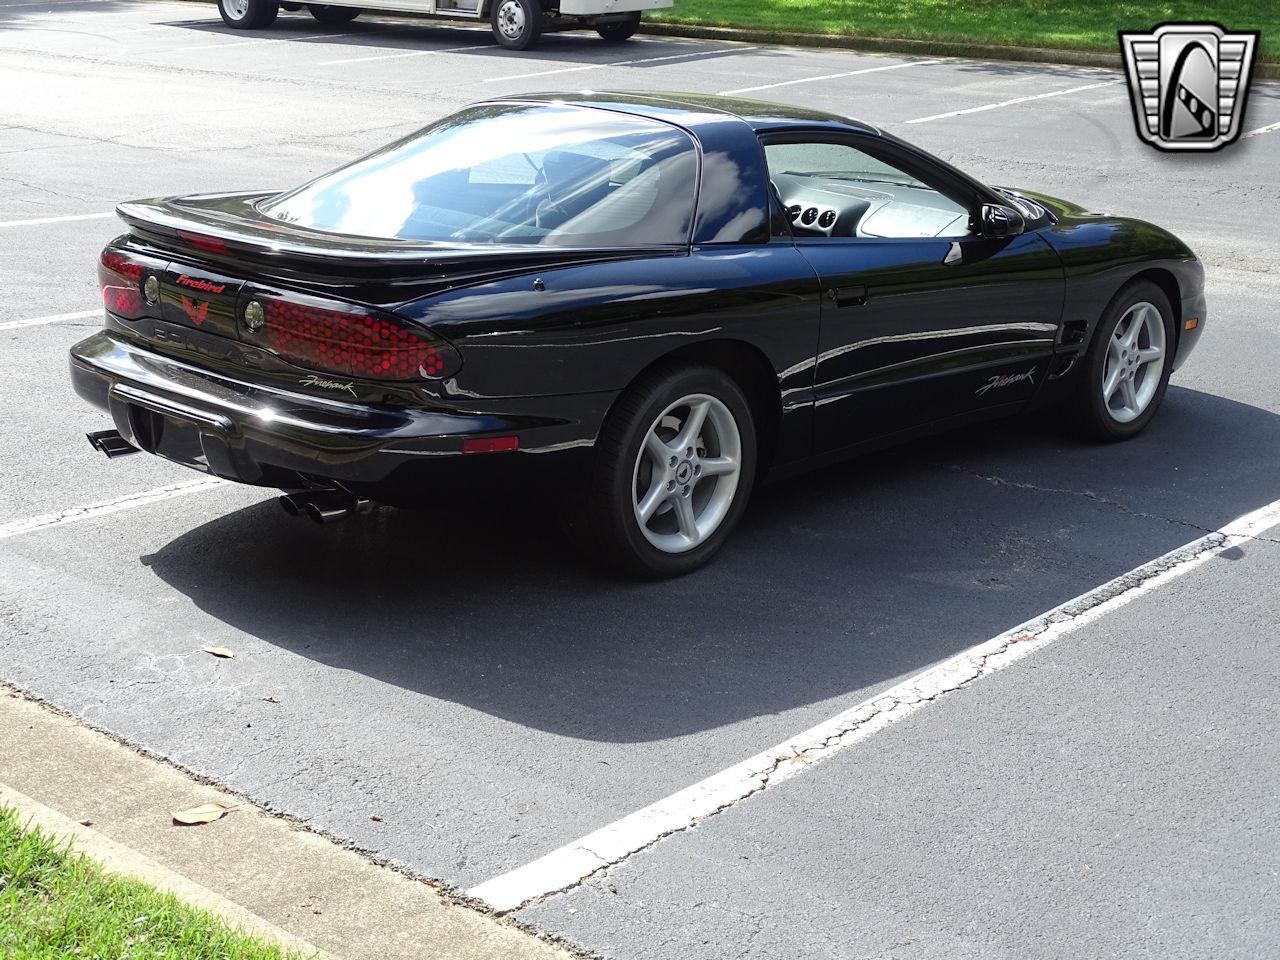 2001 Pontiac Firebird 31